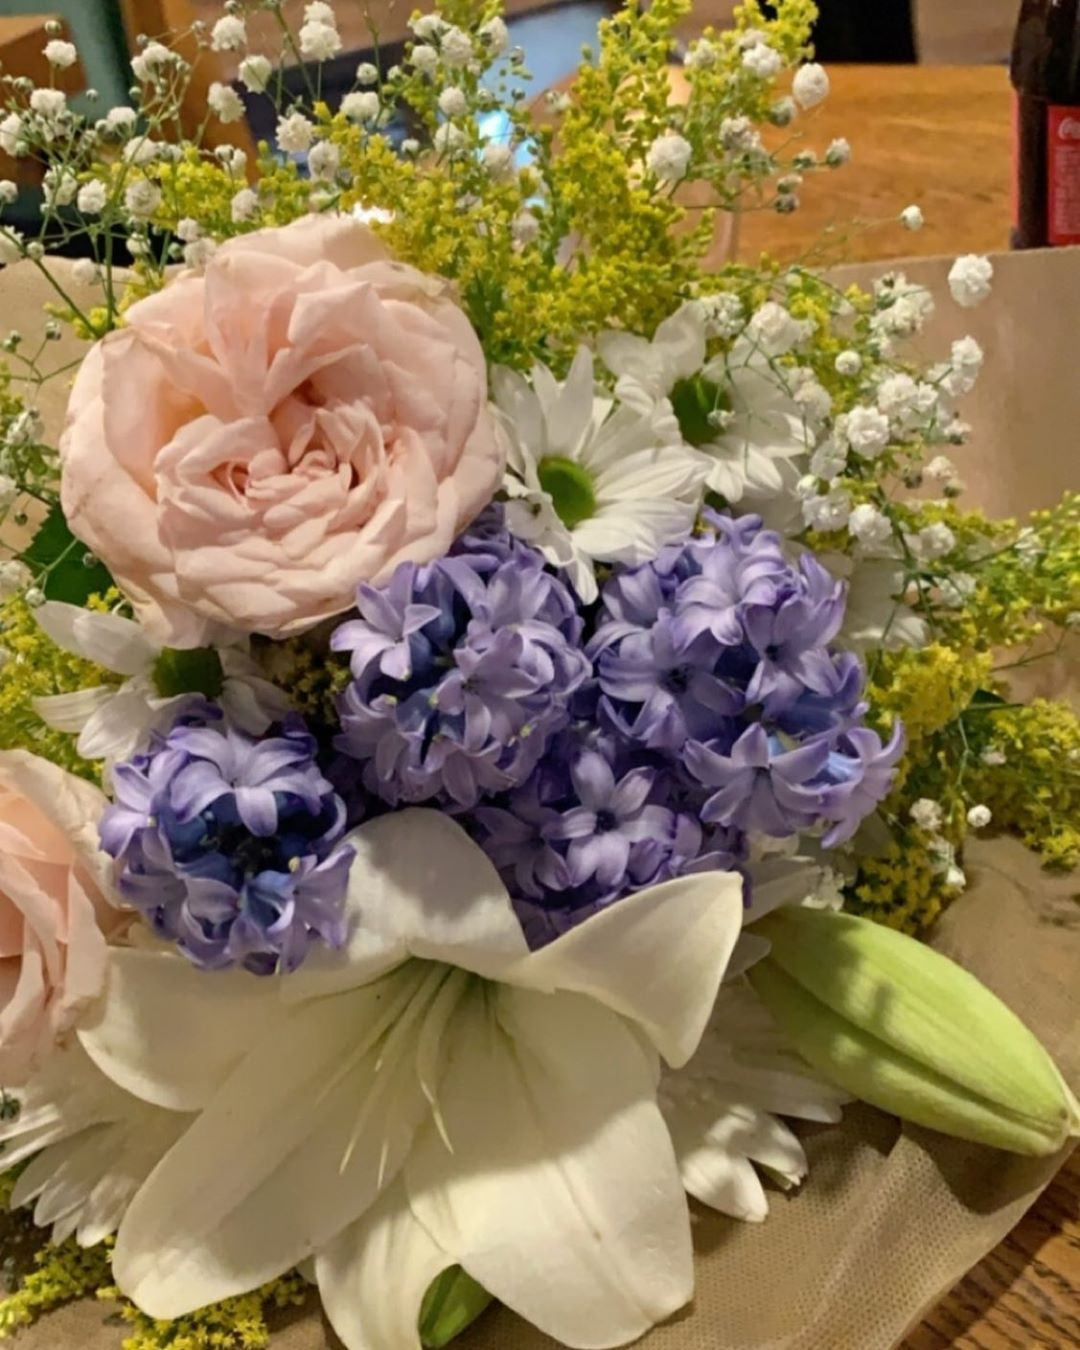 لافندر ورد Lavender هدايا توصيل نوفمبر فواحة Flowers اكاليل Gift Flowerbunch ورد طبيعي صناعي ورد طبيعي كوش افراح تجهيز منا Floral Wreath Floral Wreaths